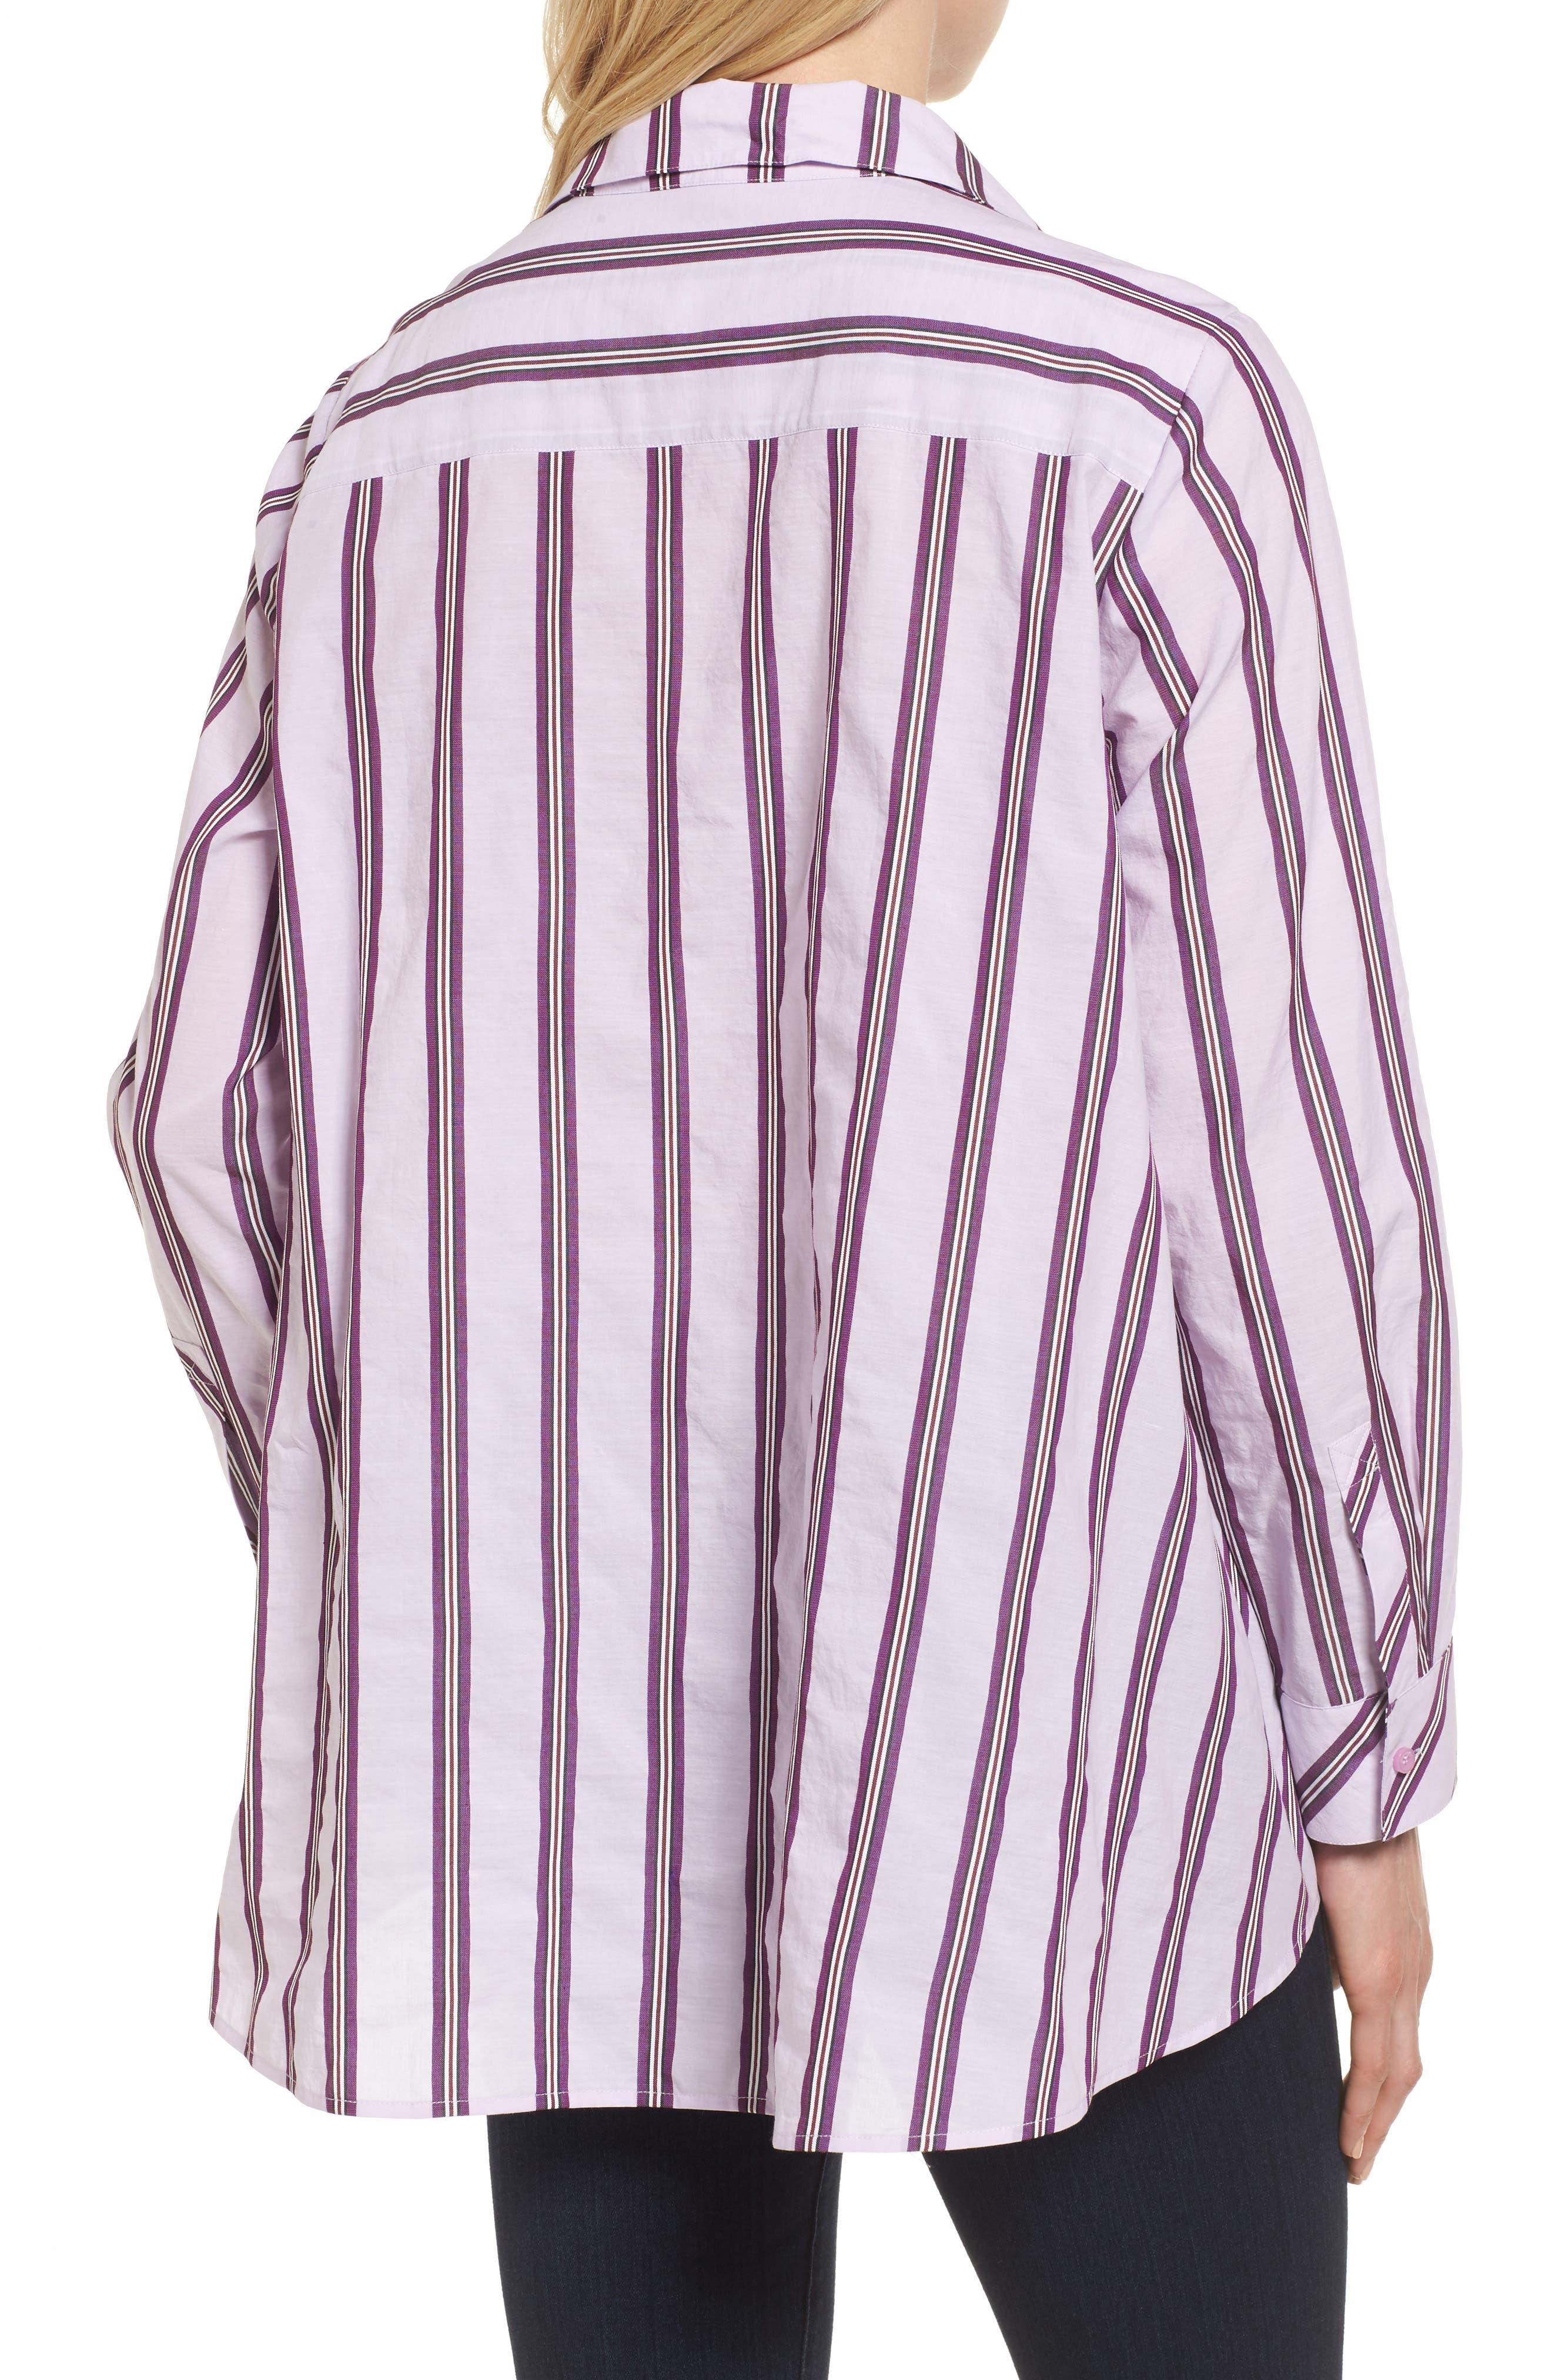 Oversize Stripe Shirt,                             Alternate thumbnail 2, color,                             680